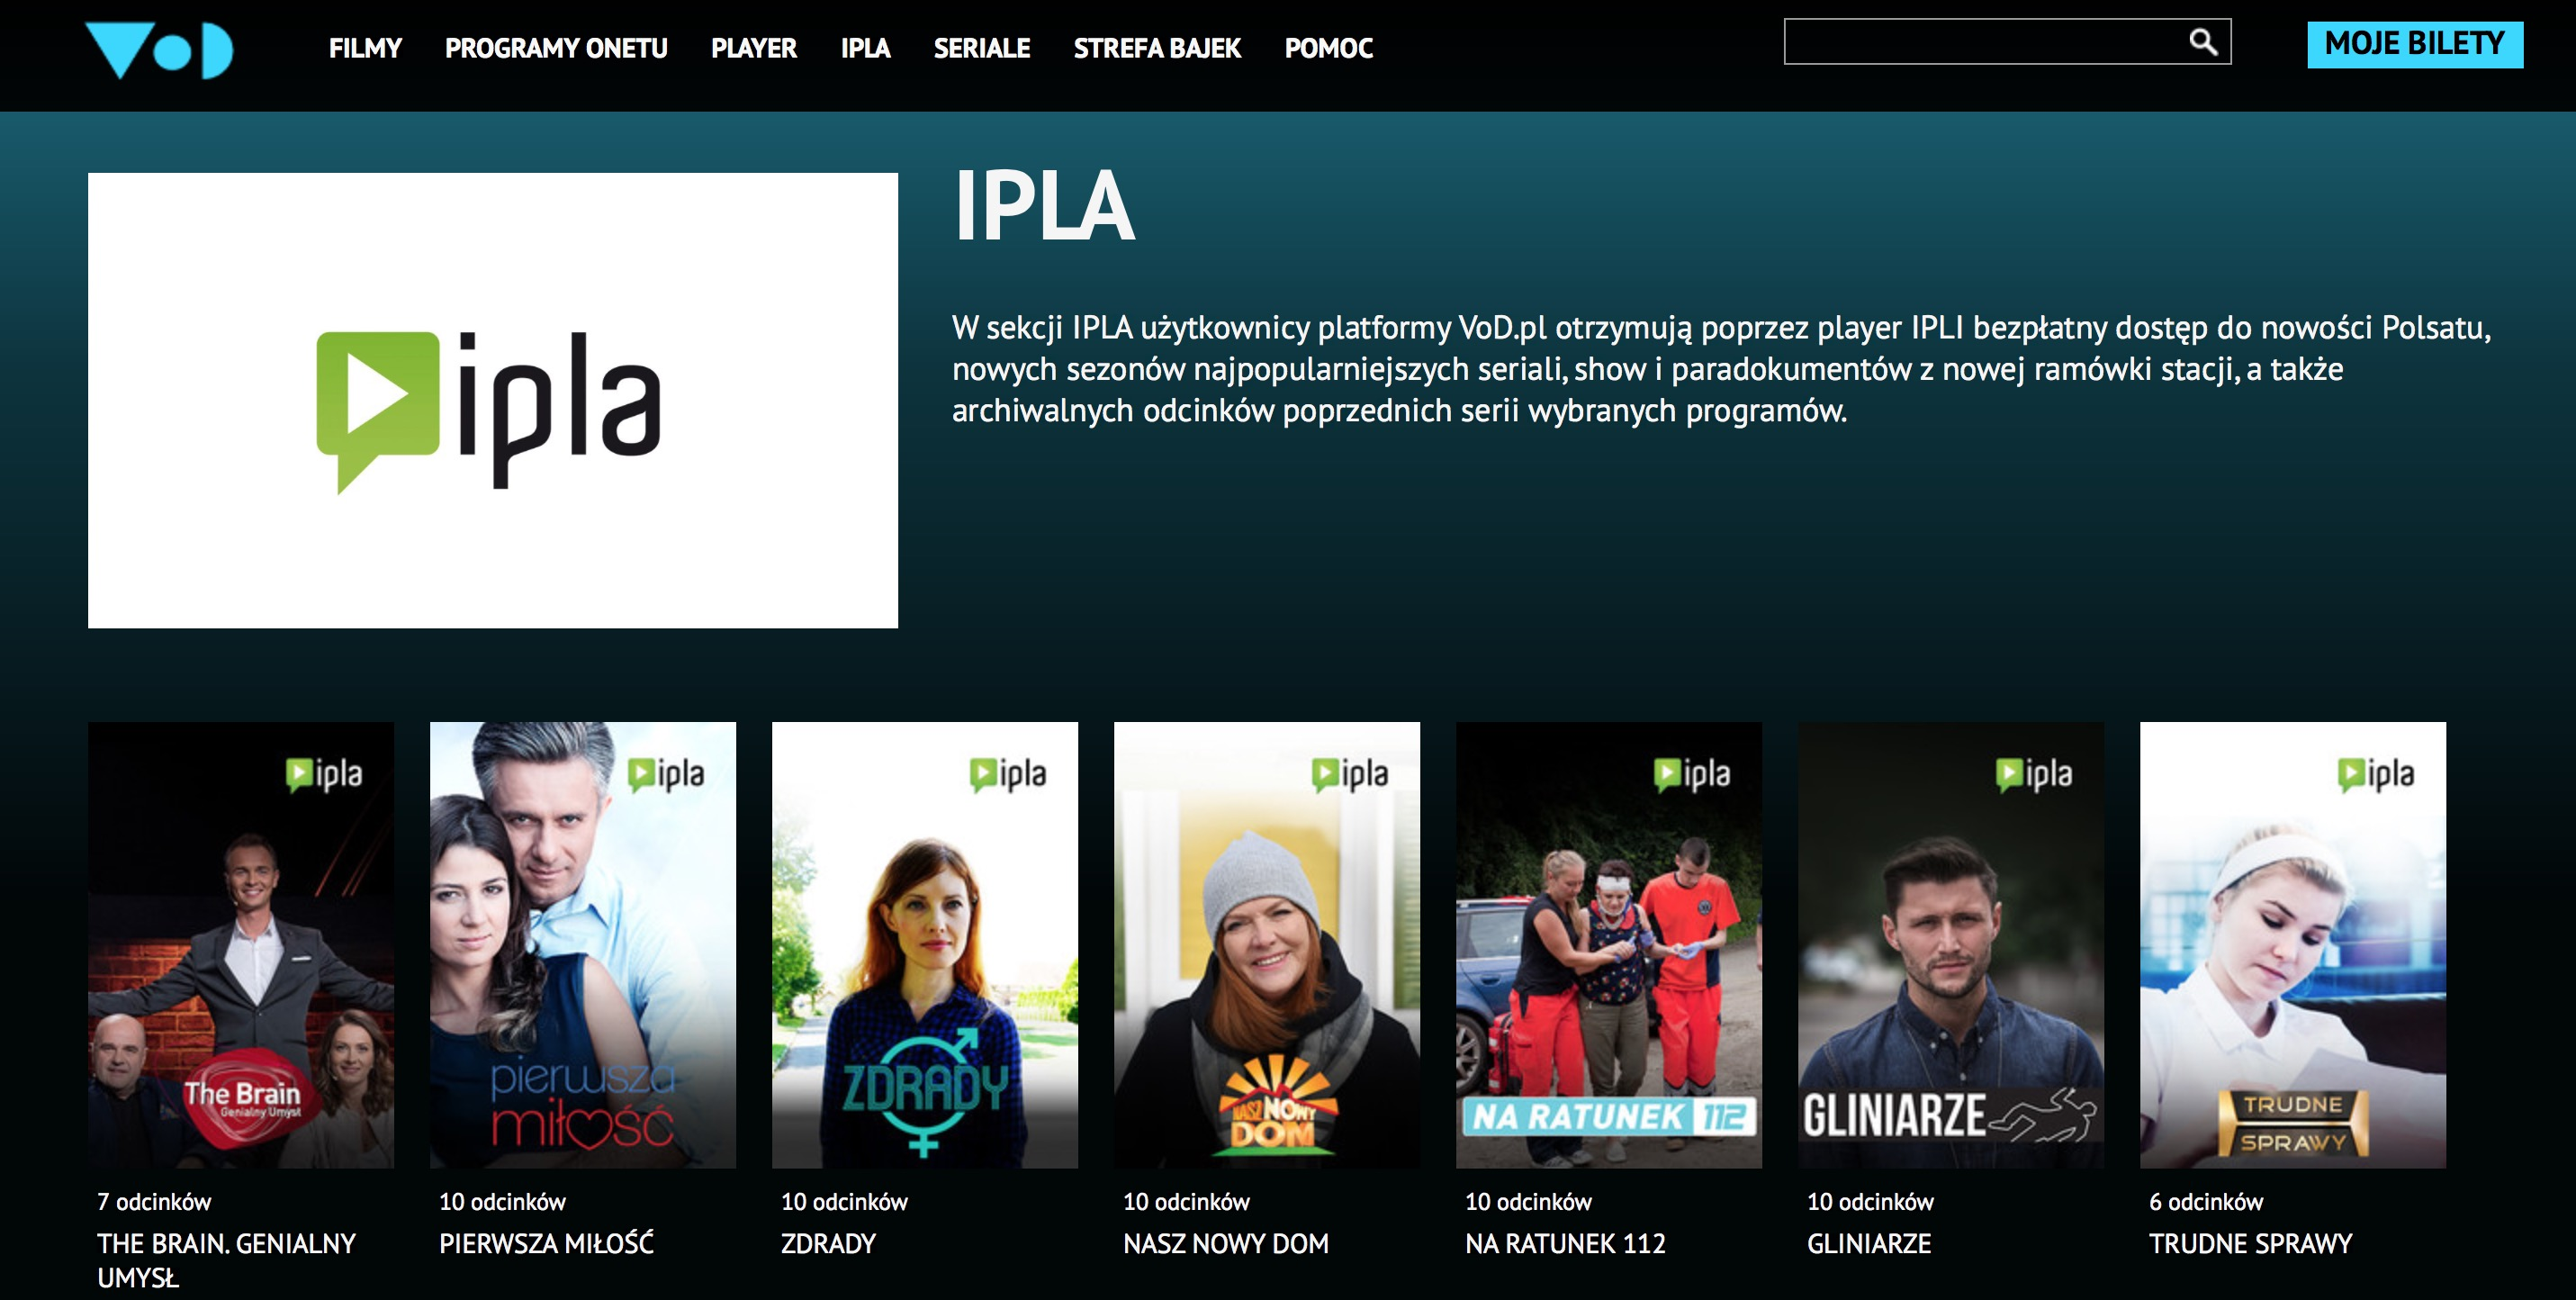 Vod.pl Ipla i Player.pl